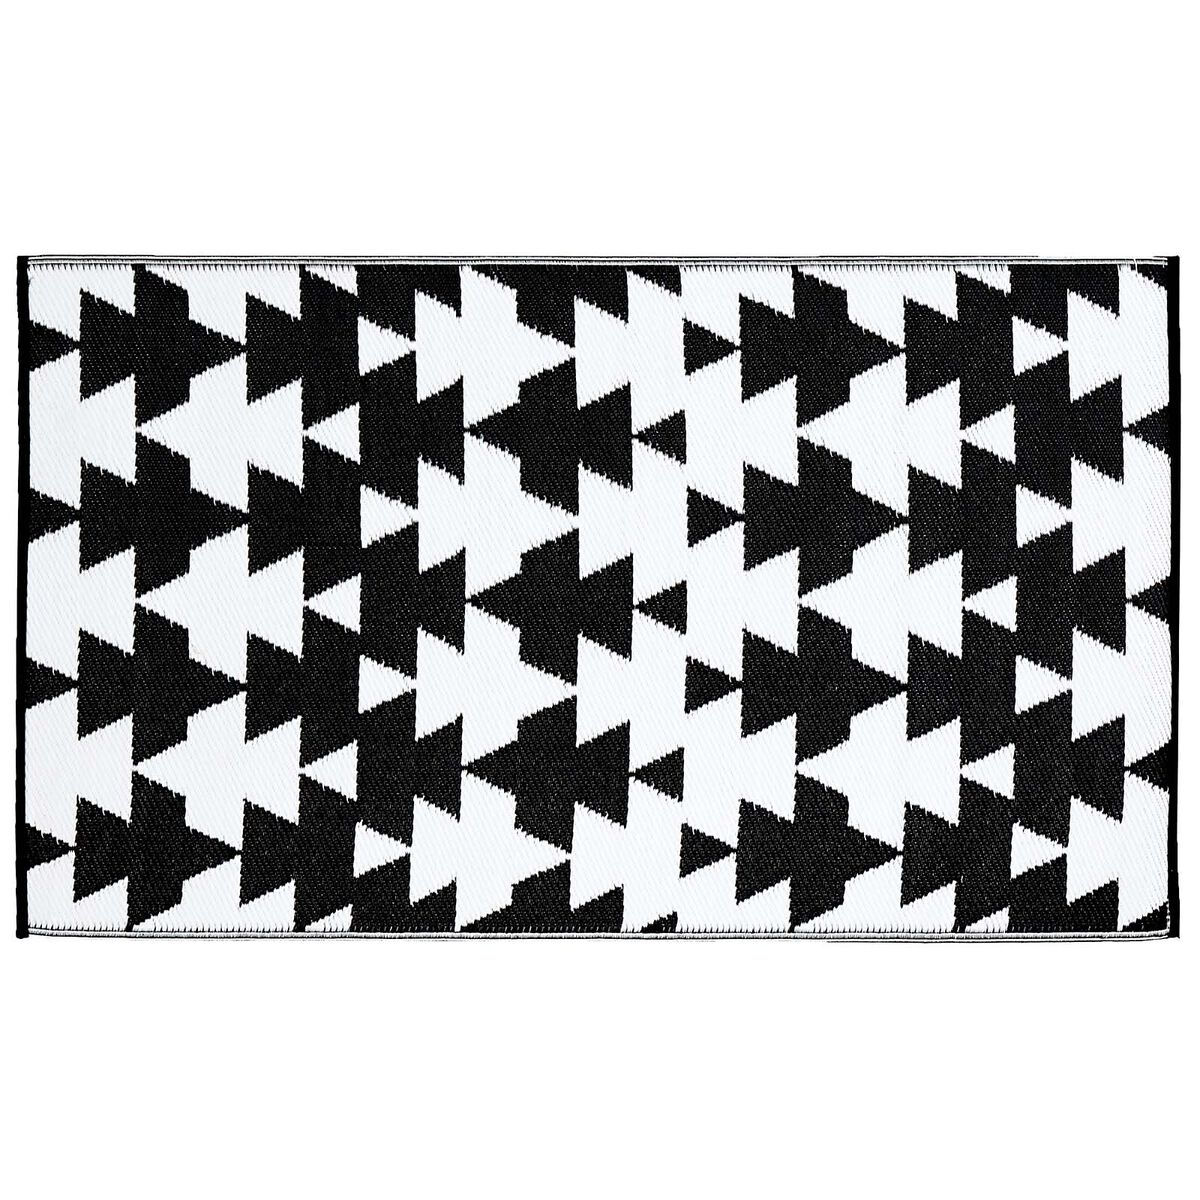 outdoor teppich grafik ca b 90cm x l 150cm schwarz wei depot de. Black Bedroom Furniture Sets. Home Design Ideas